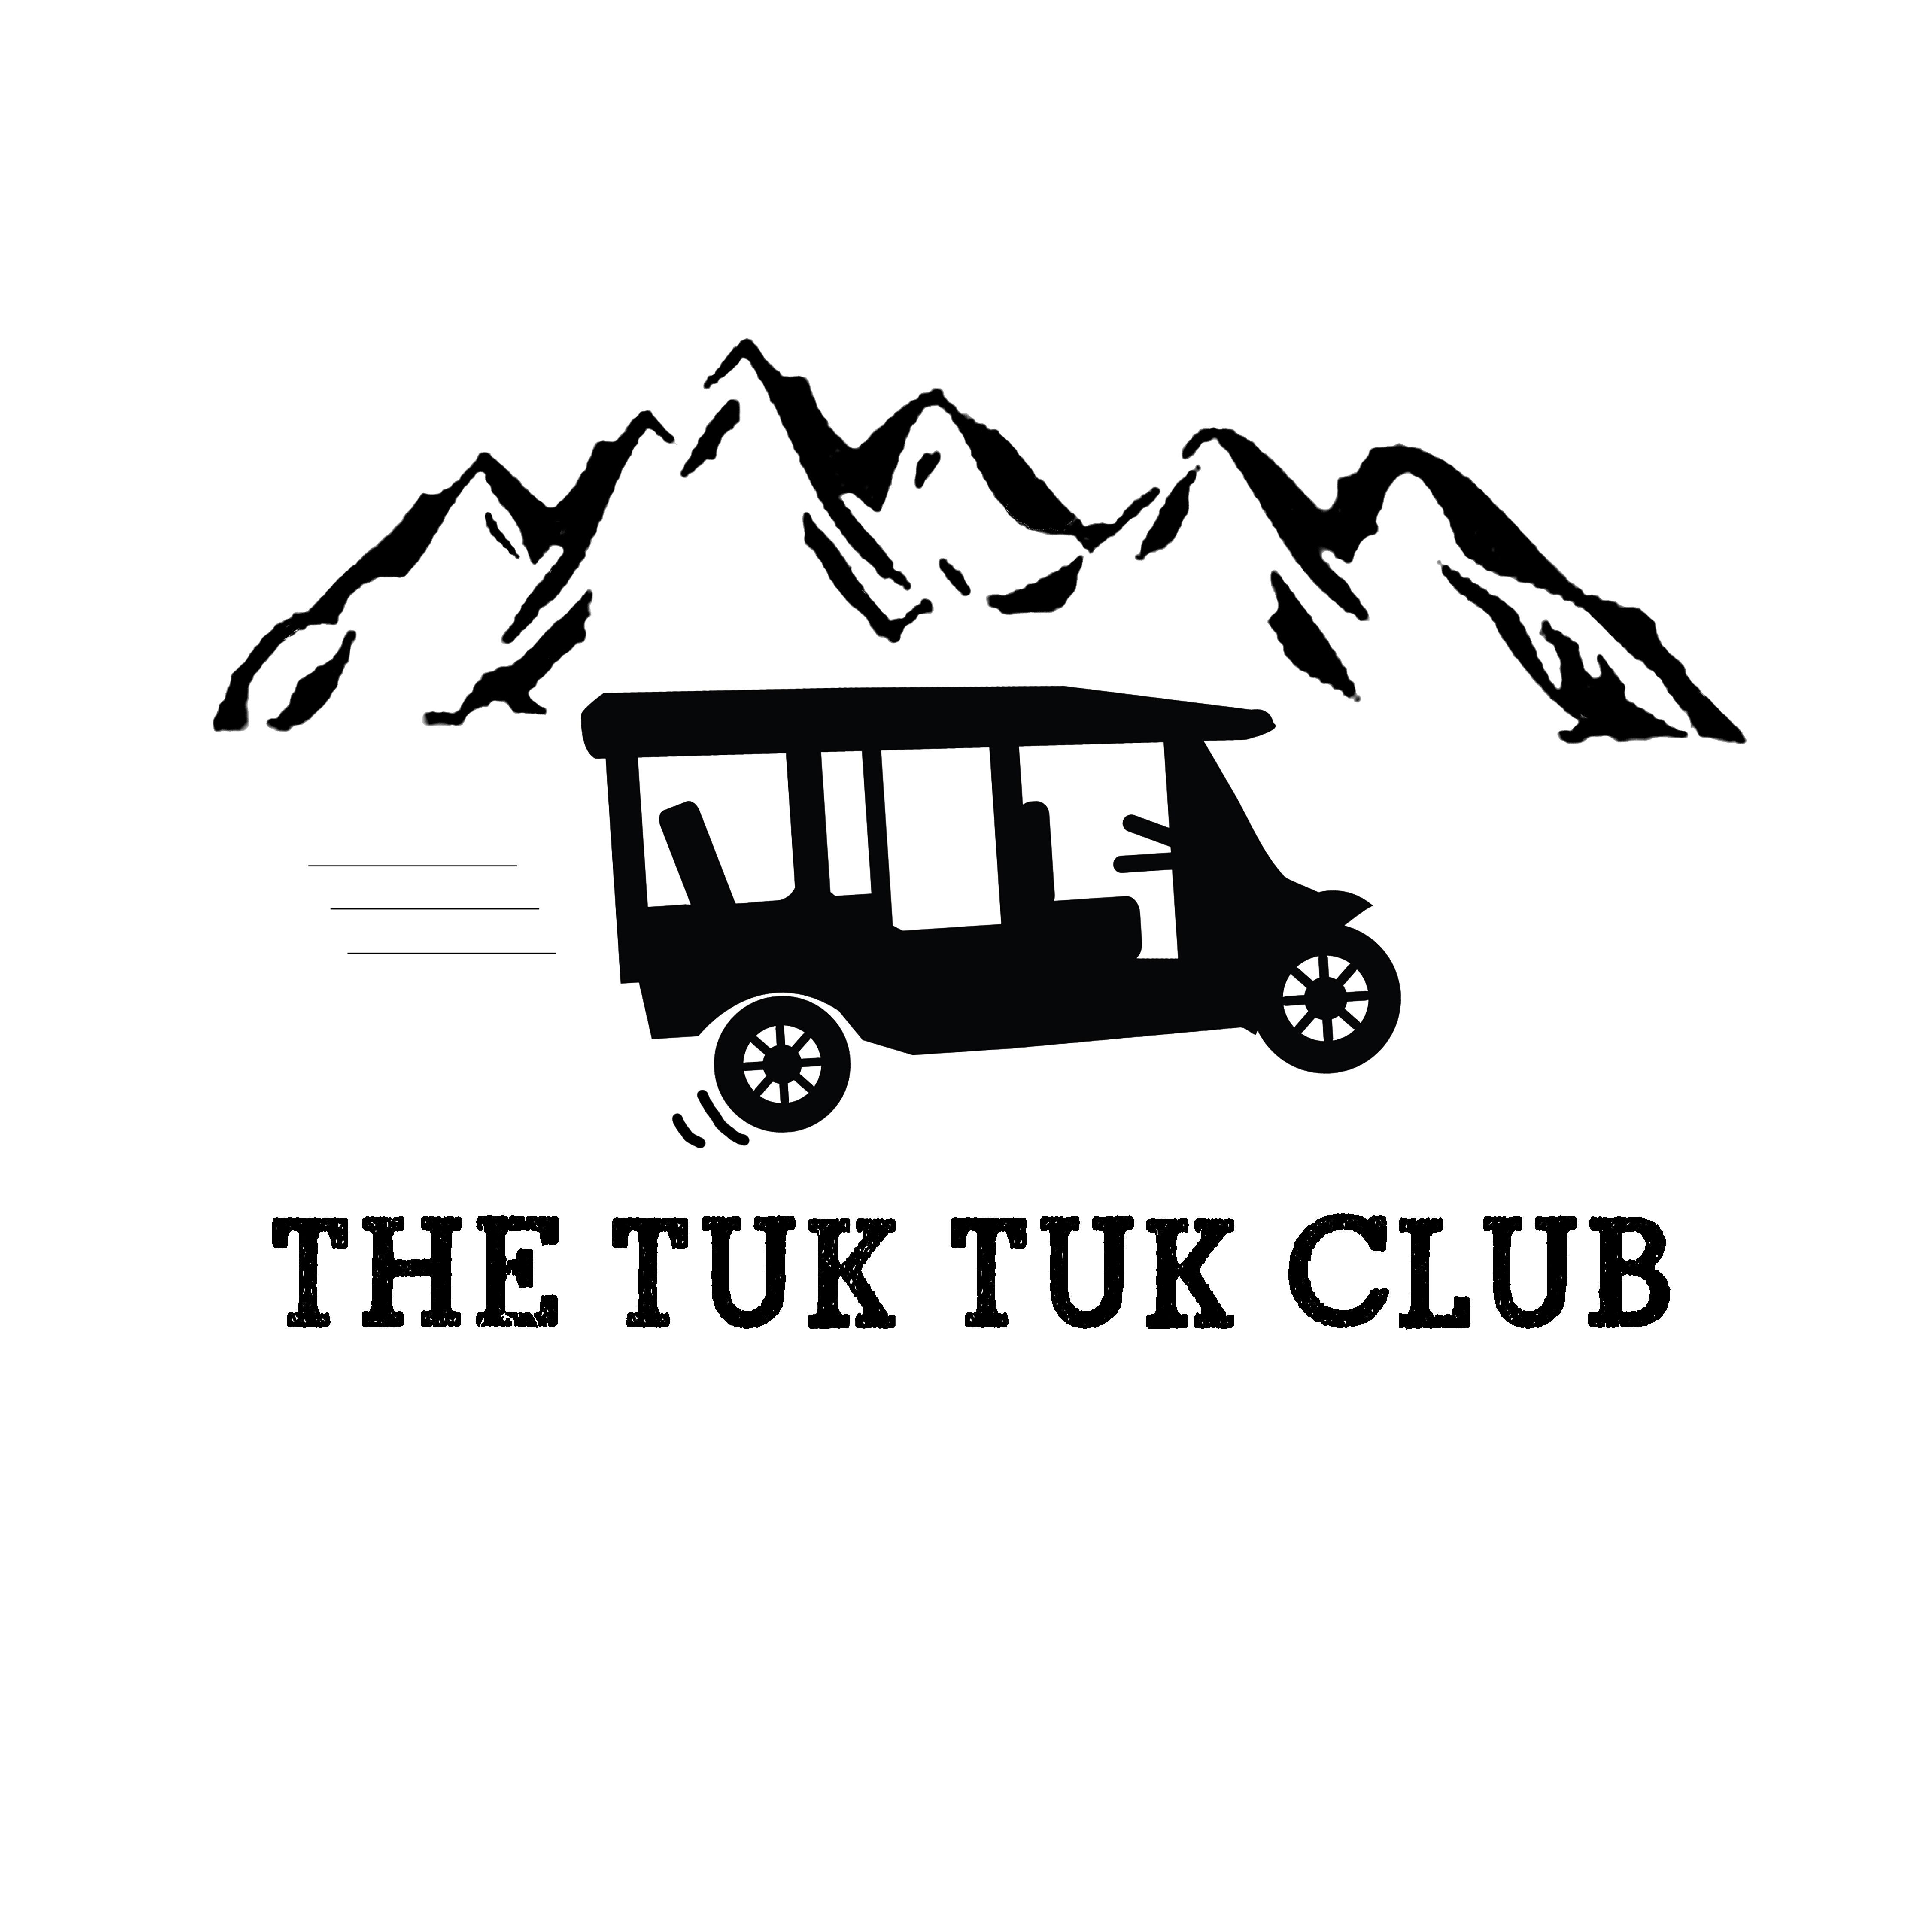 The Tuk Tuk Club